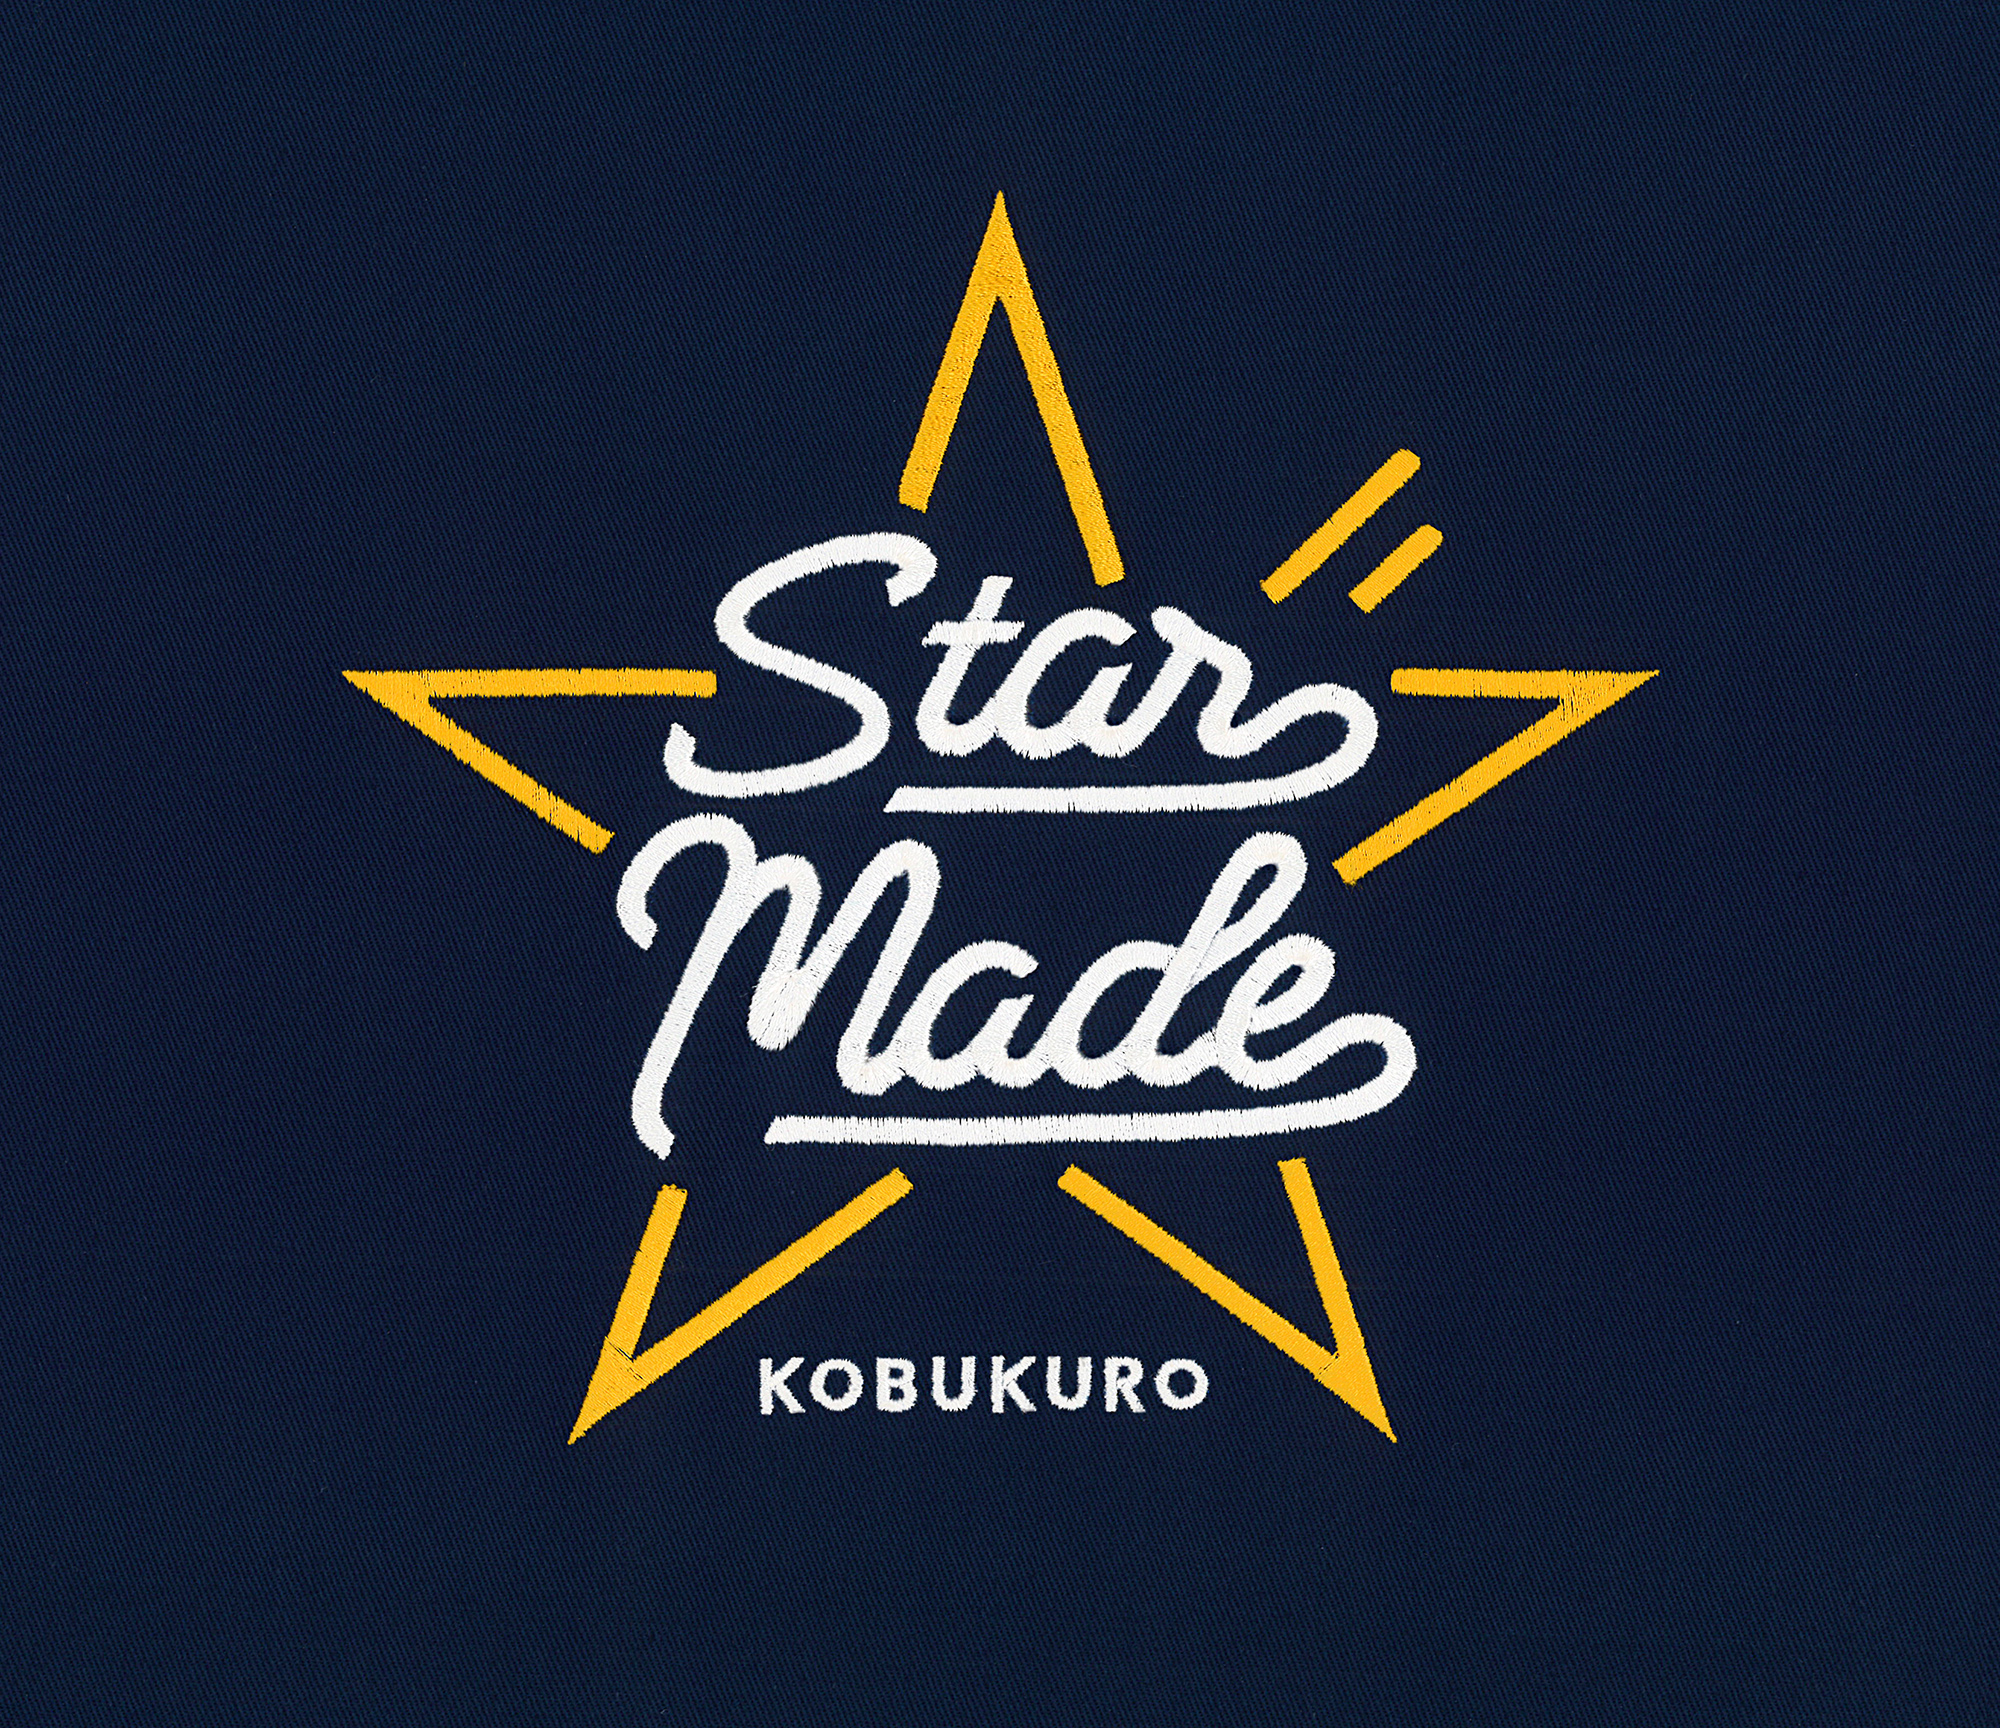 Star Made(ファンサイト会員限定盤)【完全生産限定】